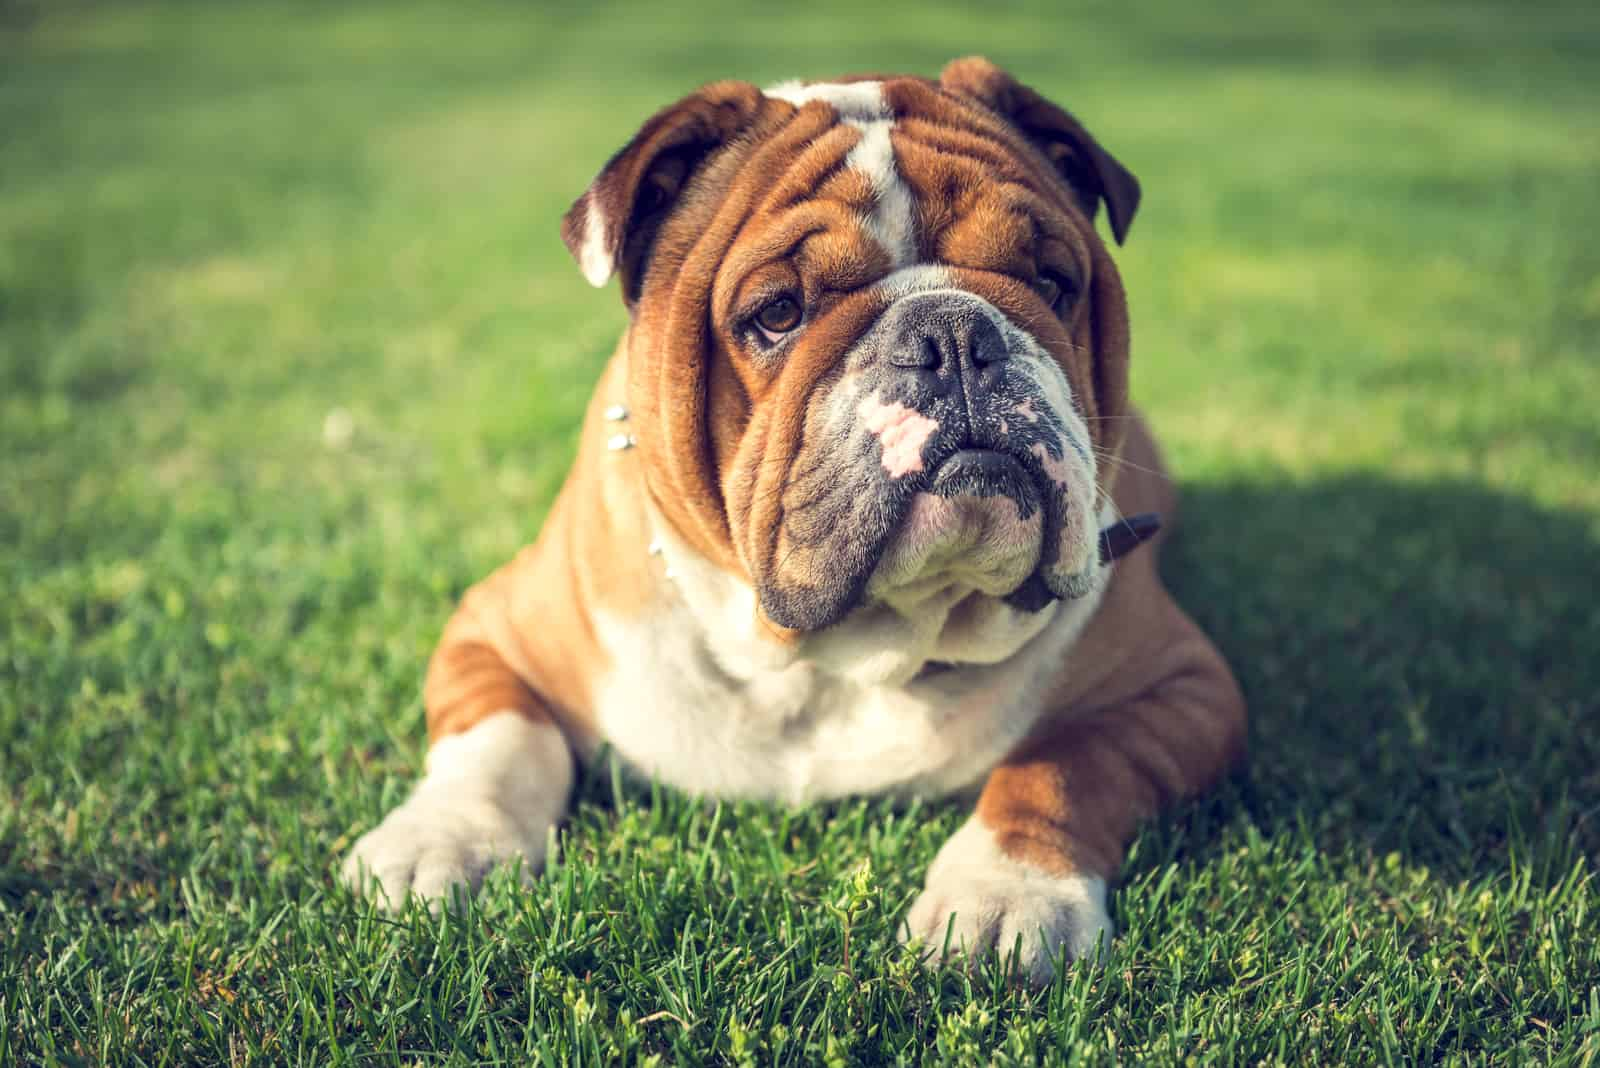 Cute English bulldog laying down on the grass